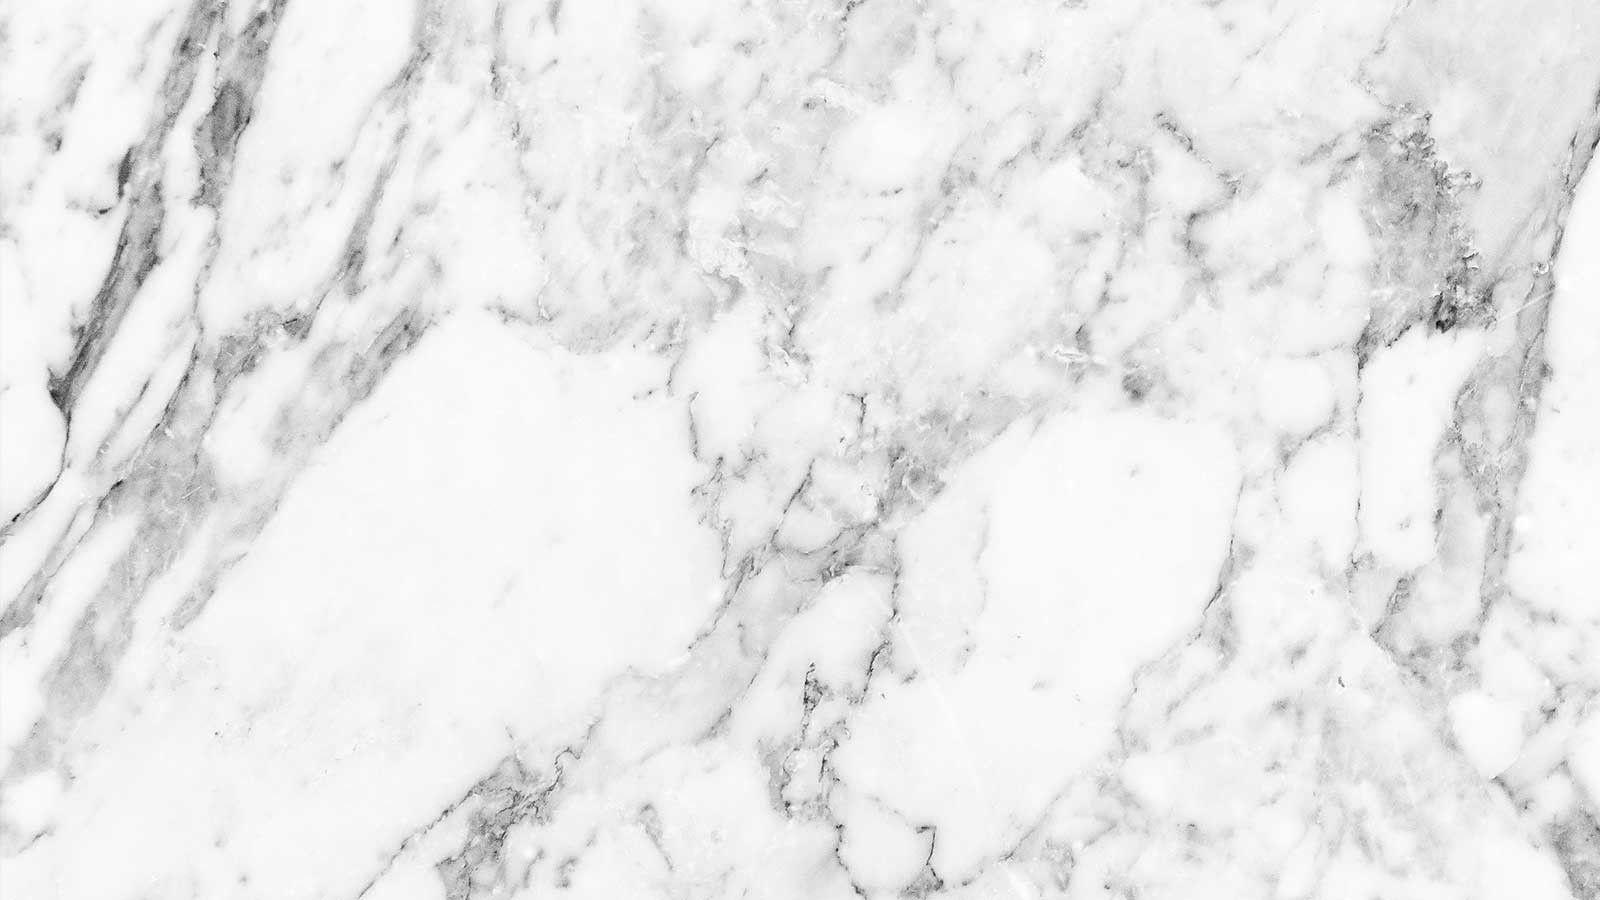 Marble Desktop Wallpapers - Top Free ...